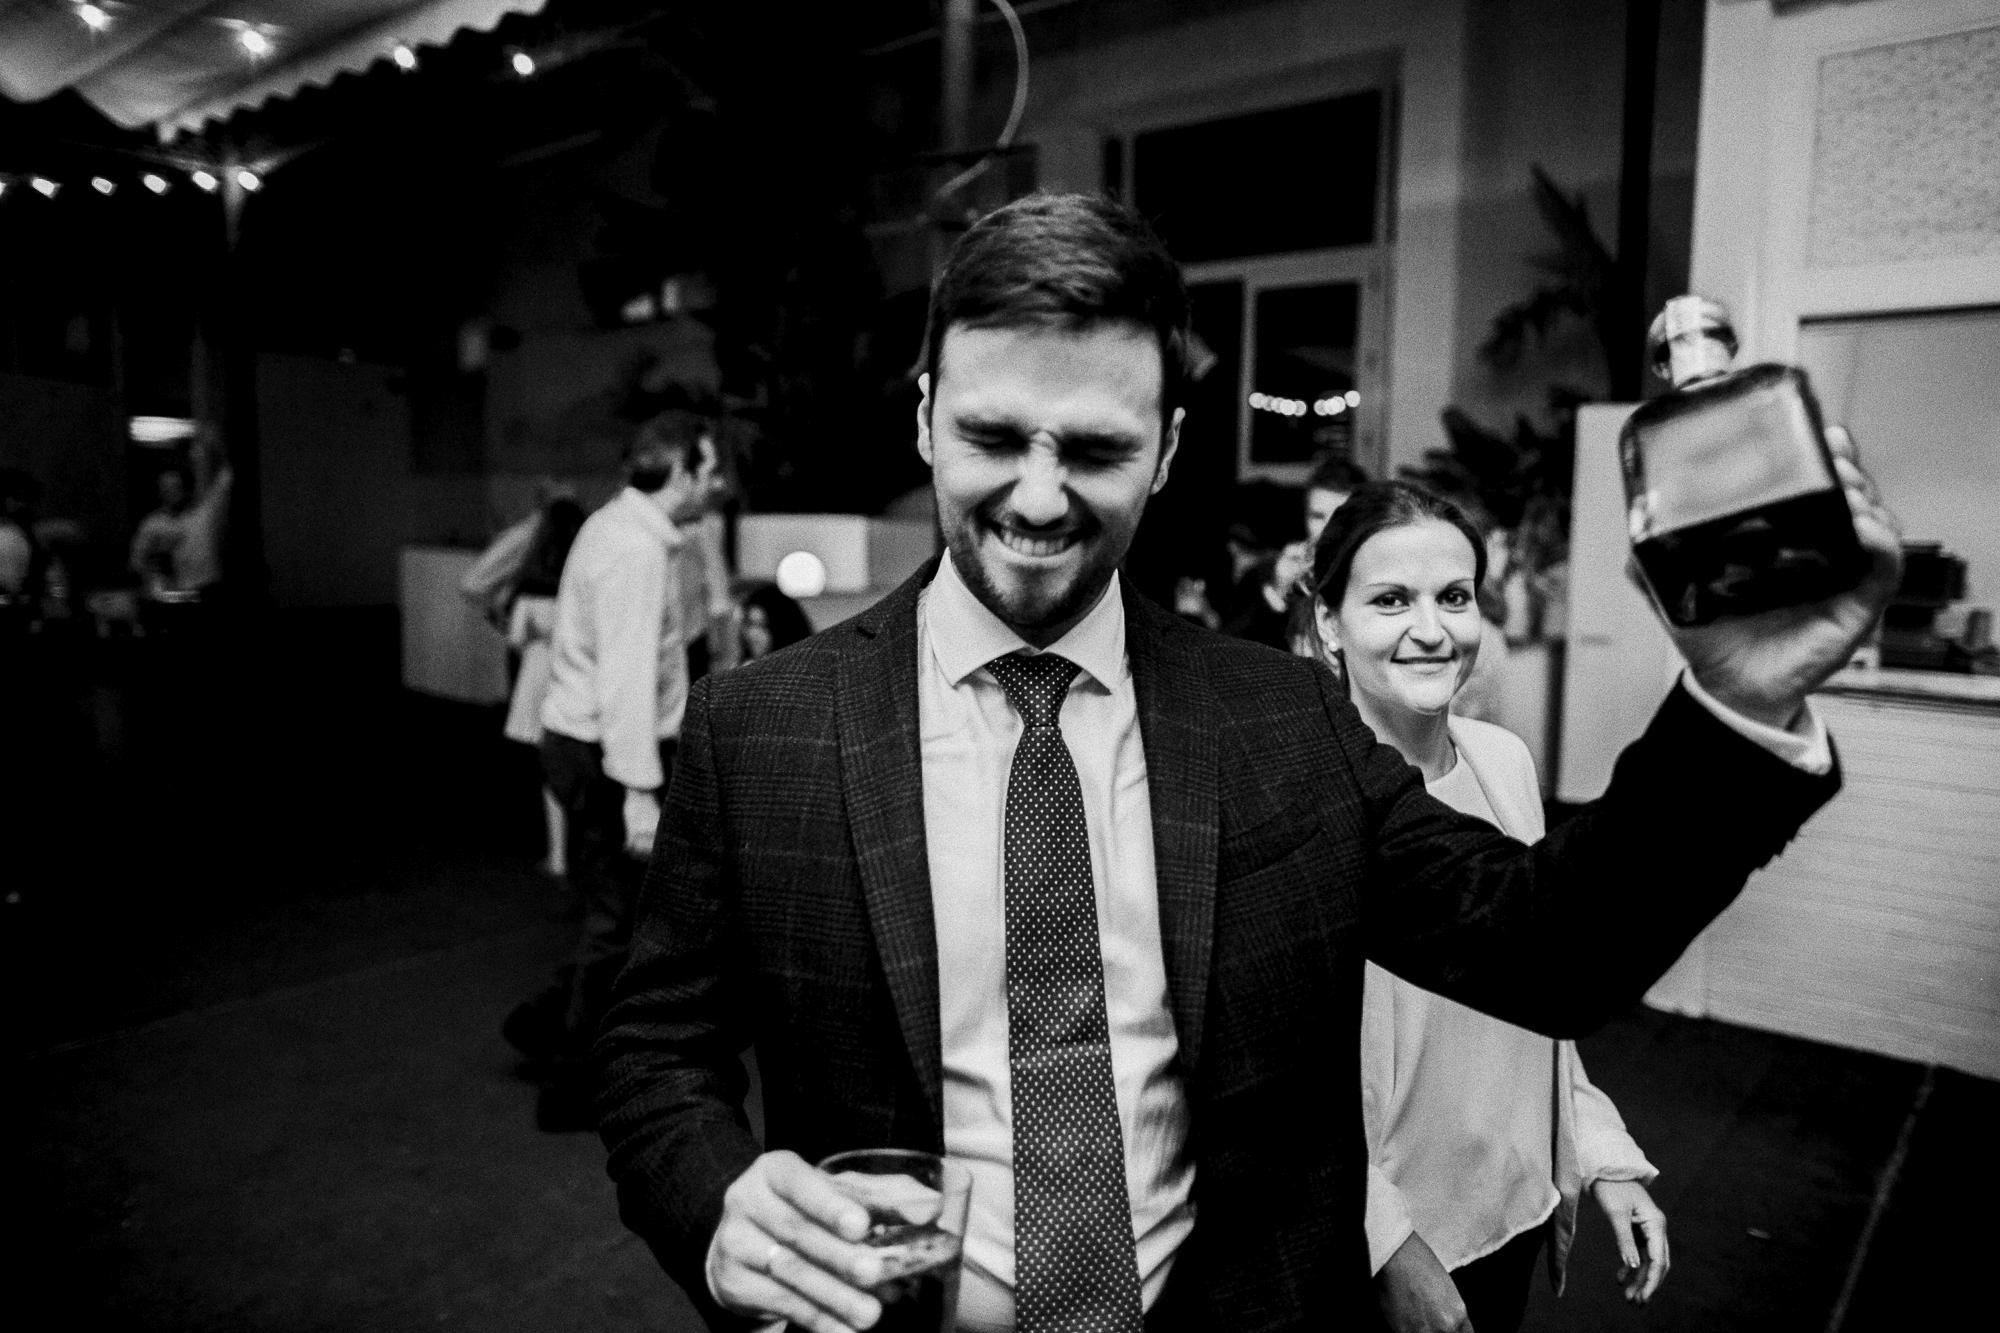 alfonso_flores_destination_wedding_photogrpaher_españa-140.jpg